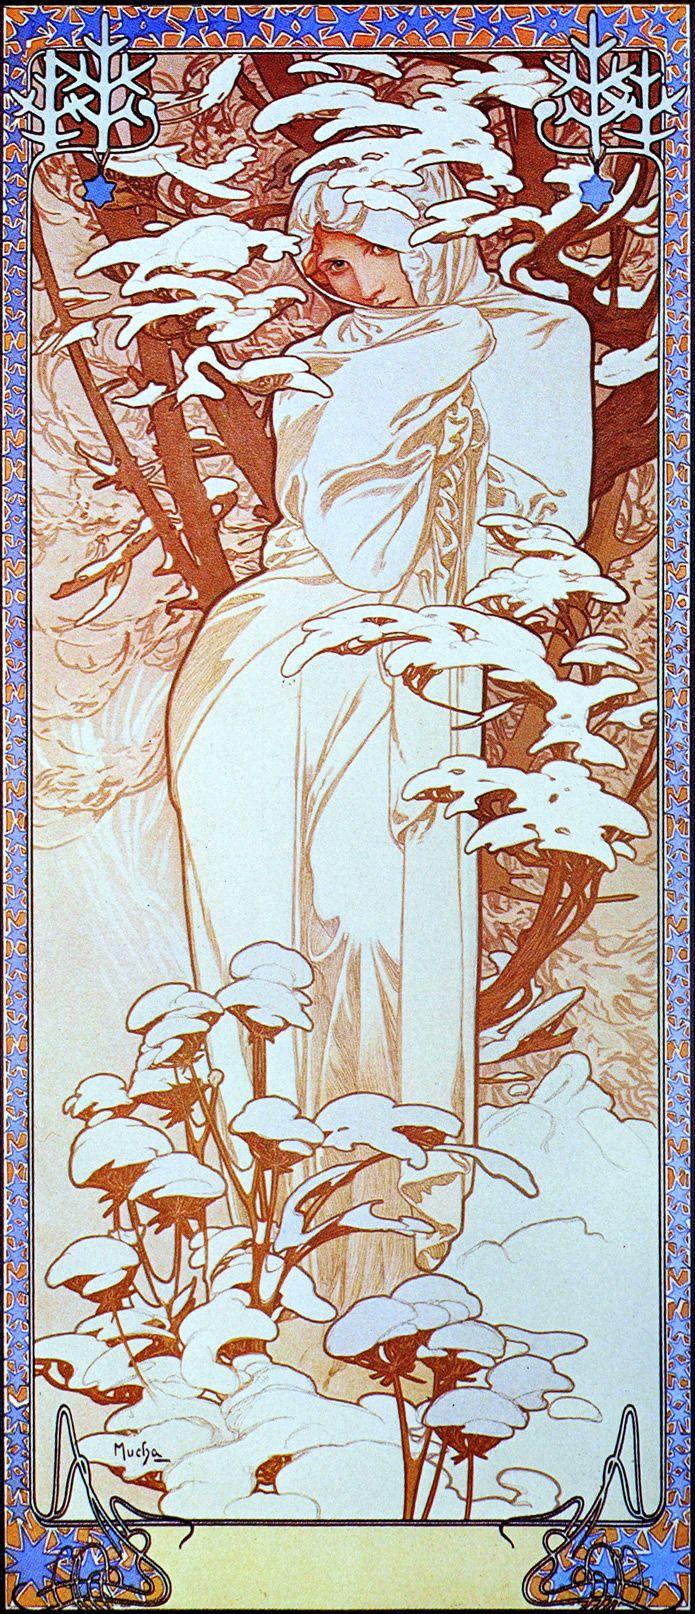 Alphonse Mucha. The Four Seasons - Winter 1900